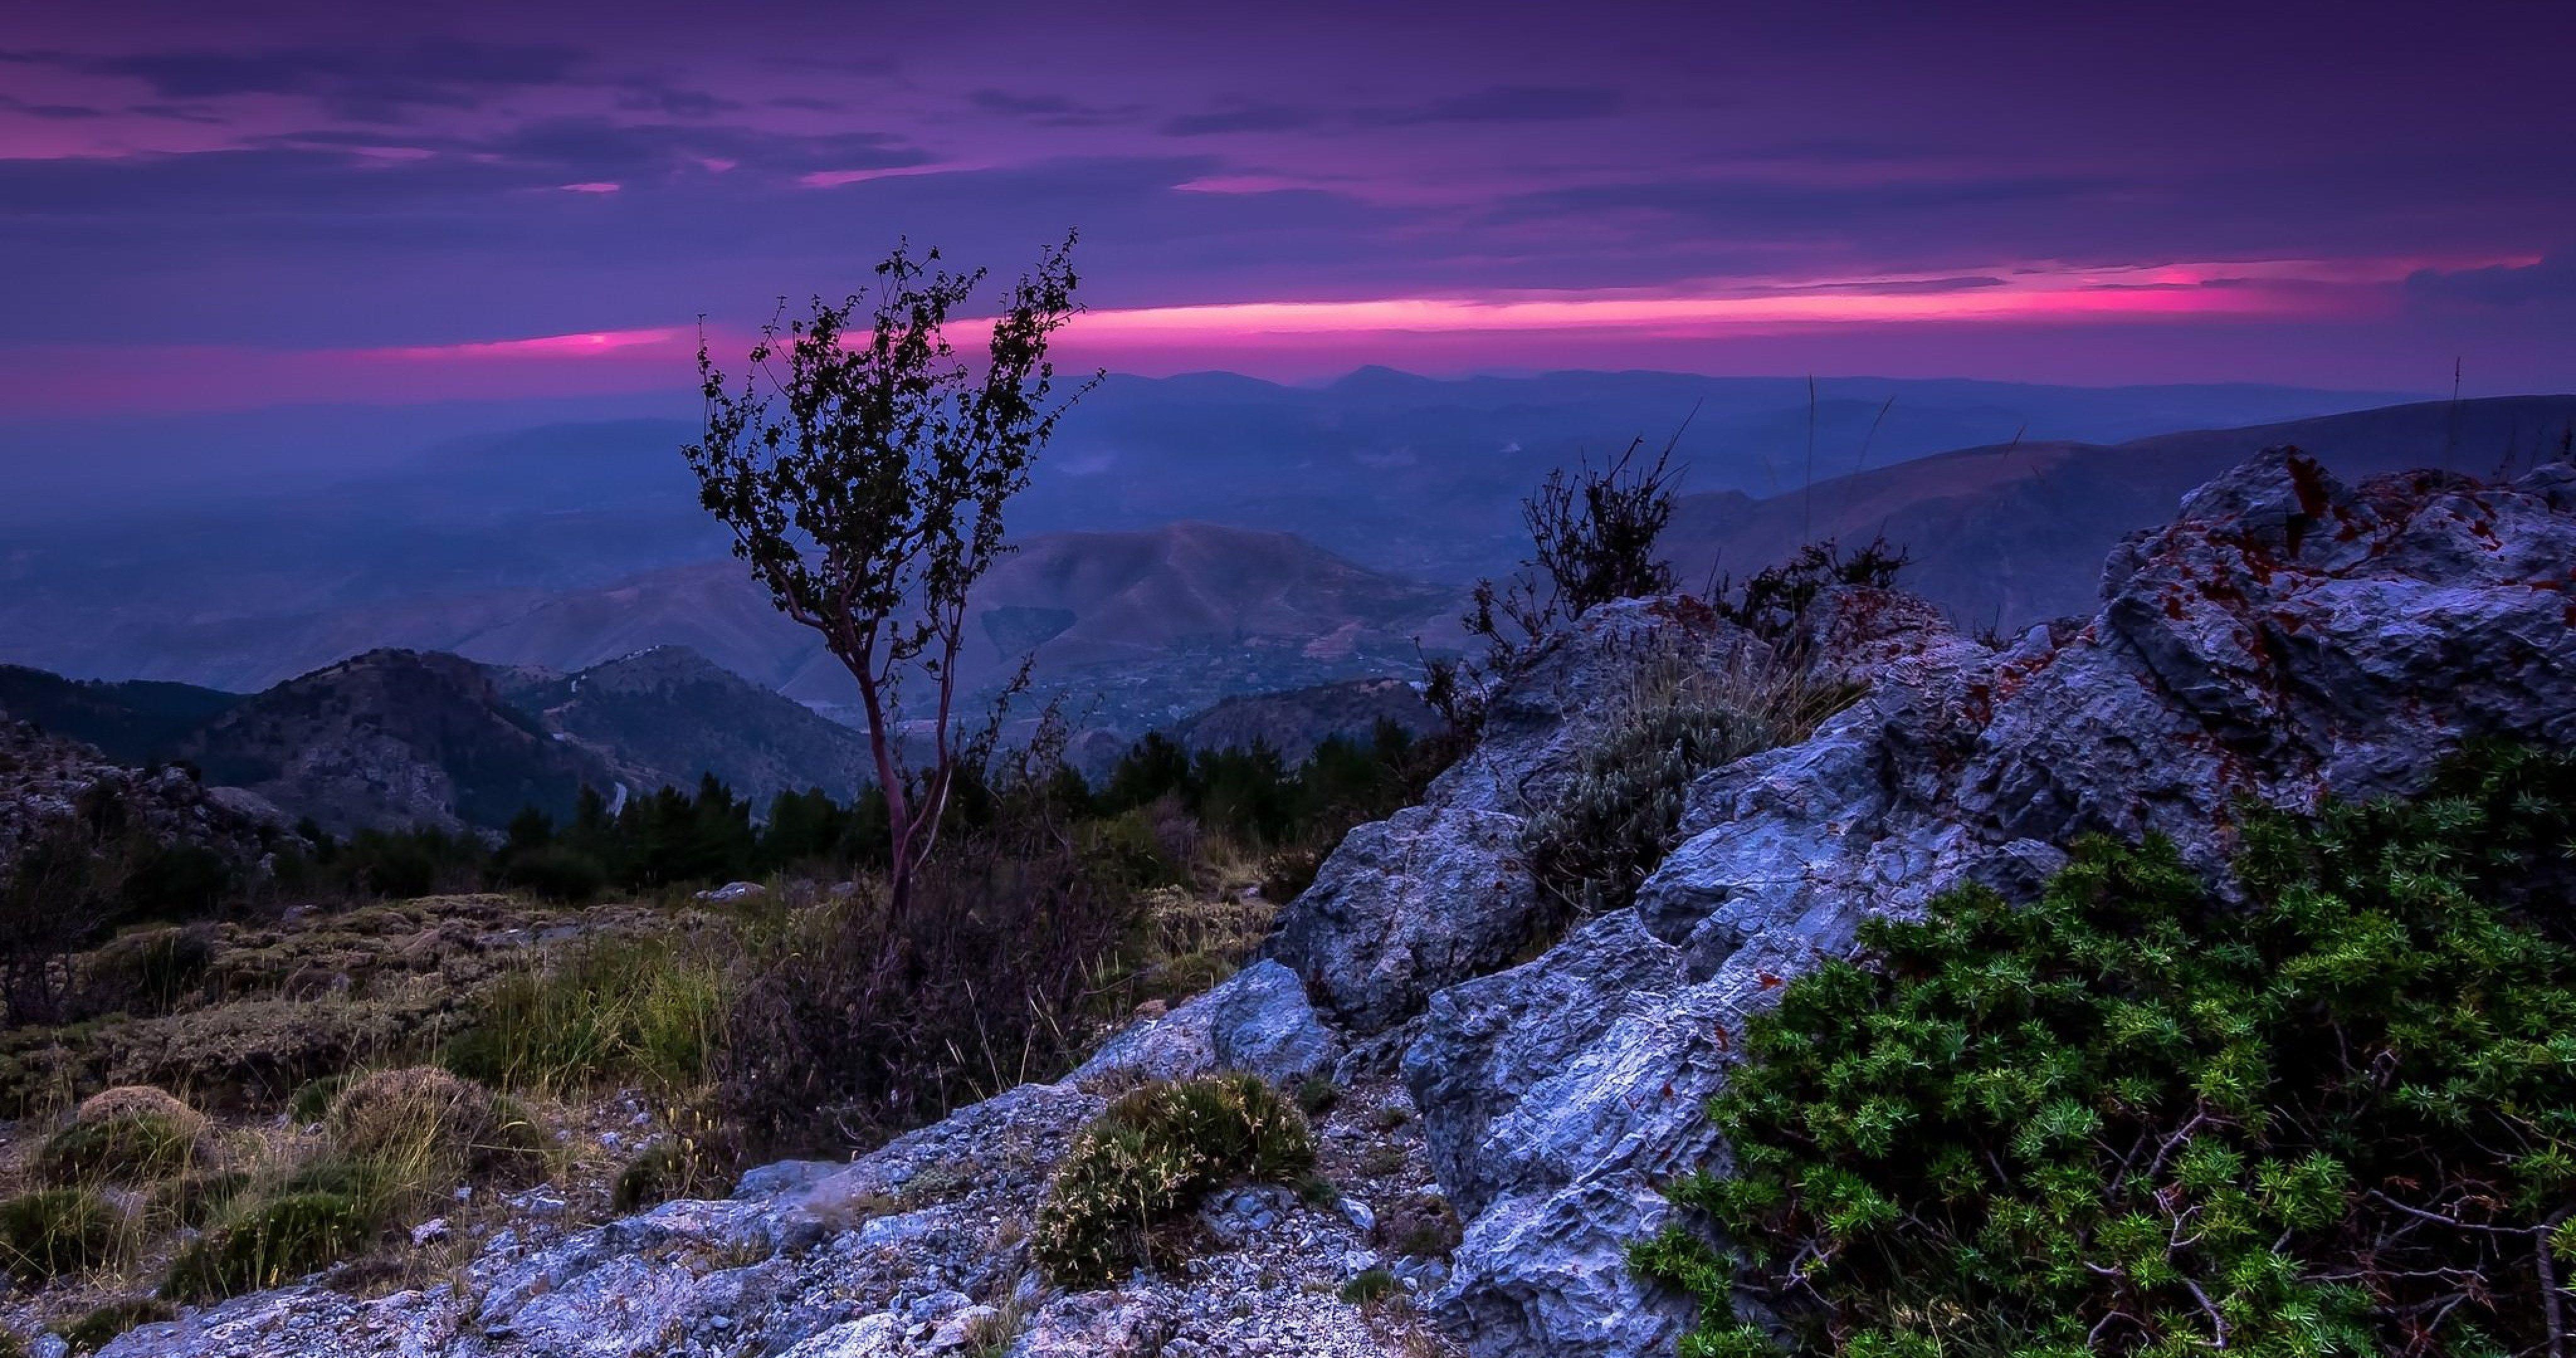 Spain Landscape Wallpapers Top Free Spain Landscape